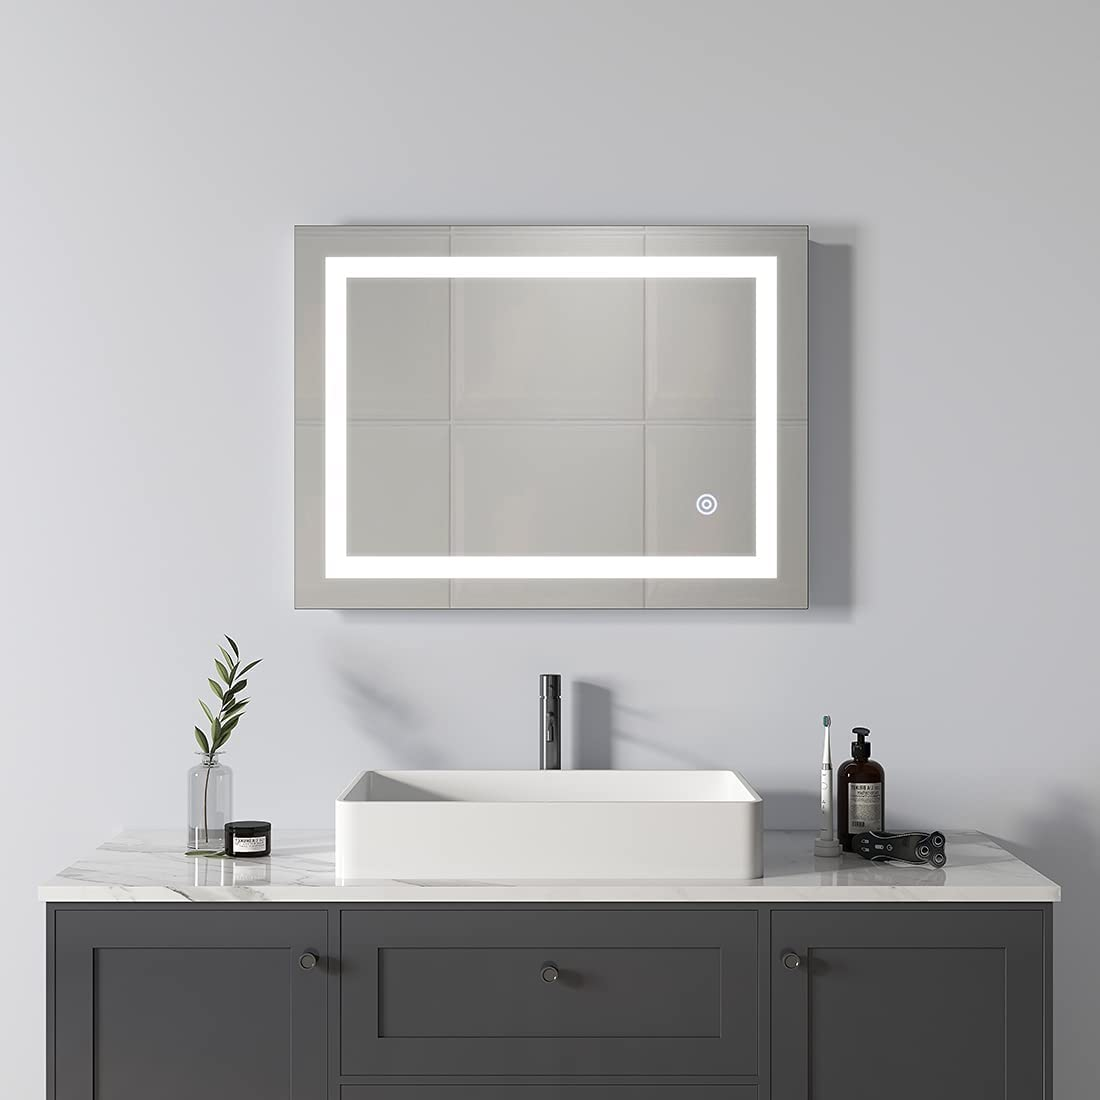 SIEPUNK 24 x 32 Inch LED Mirrors for Bath Bathroom Dimmable Wall Philadelphia Brand new Mall